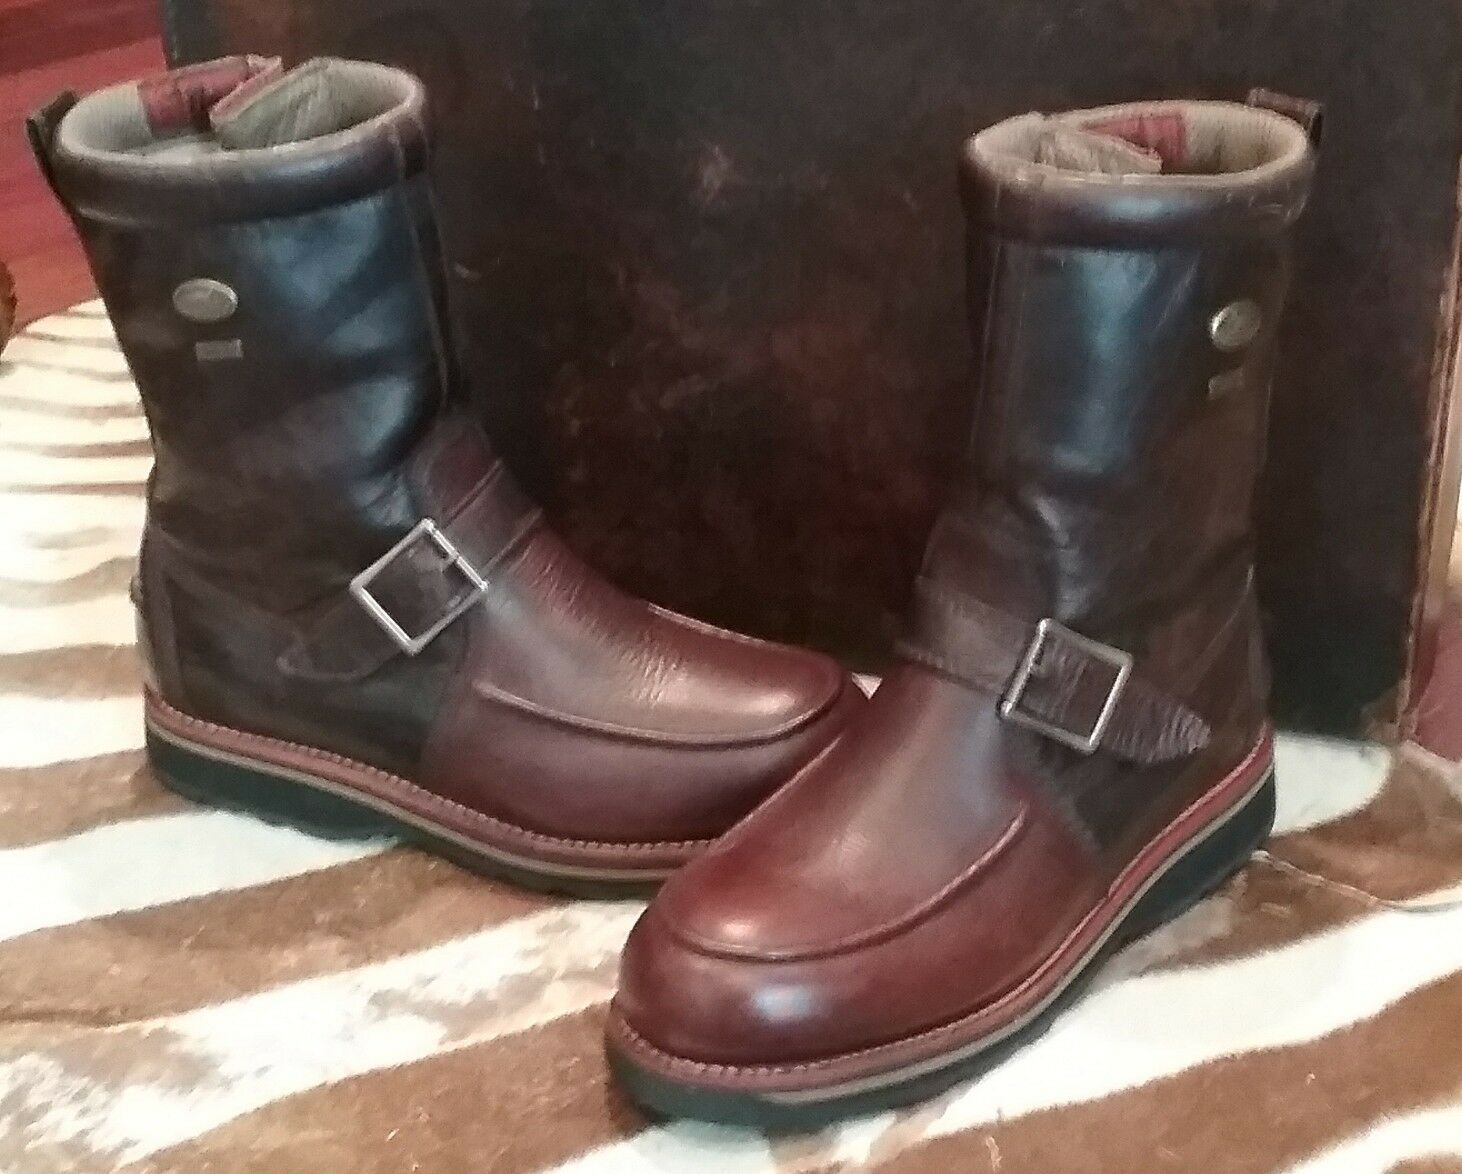 Irish Setter Wingshooter 9  Gore-Tex® Side Zip Boots, Style 855, US 9D (Men's)